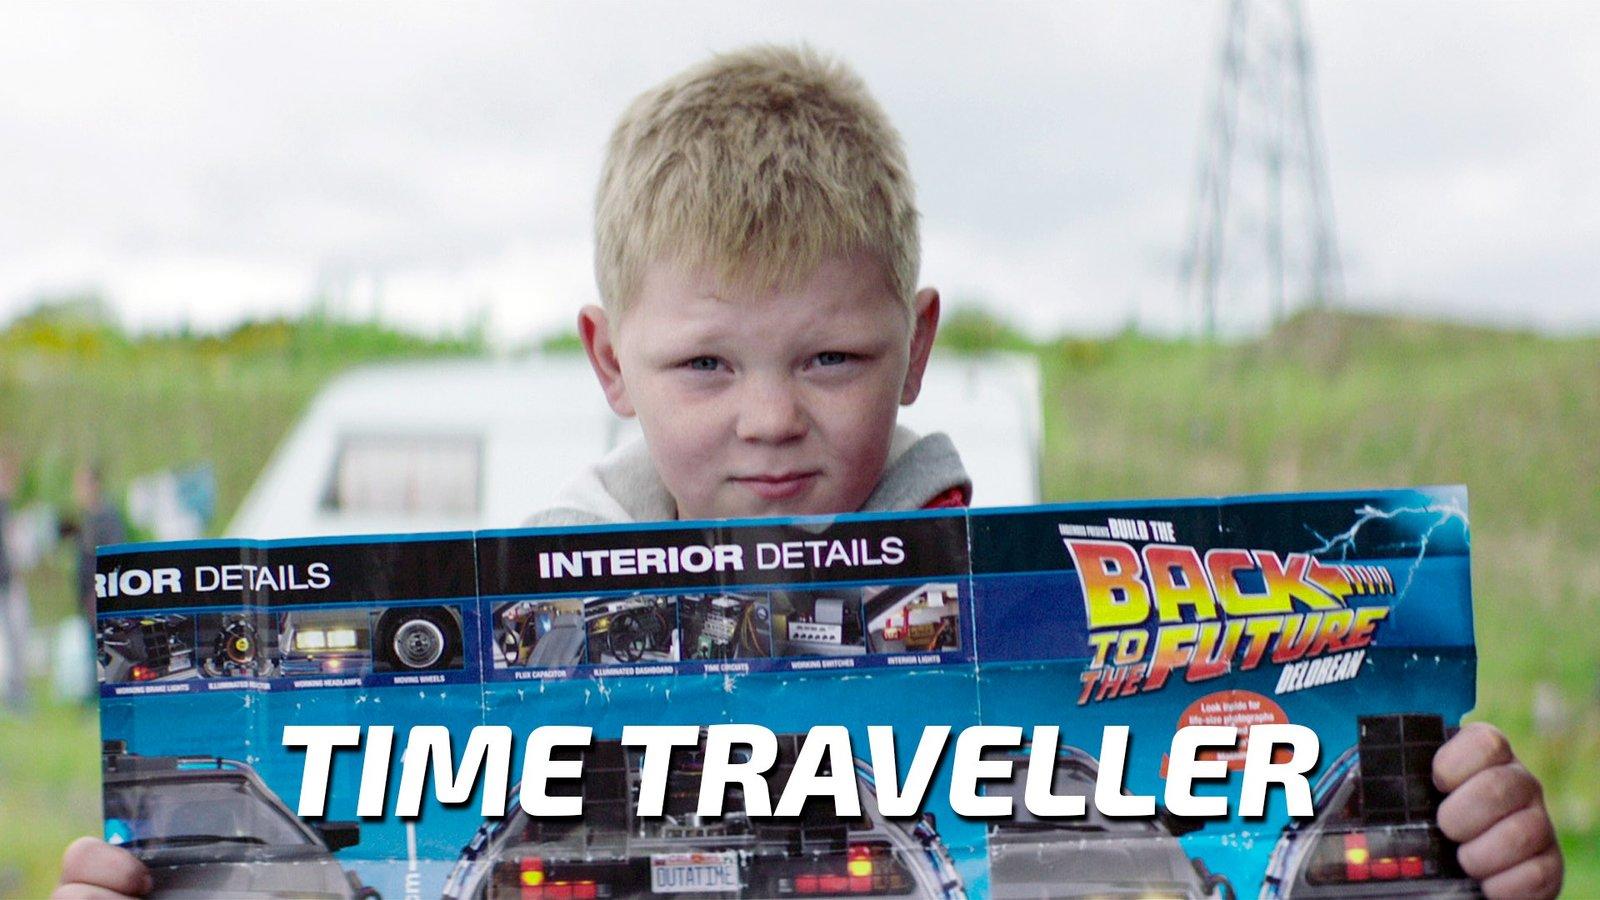 Time Traveller